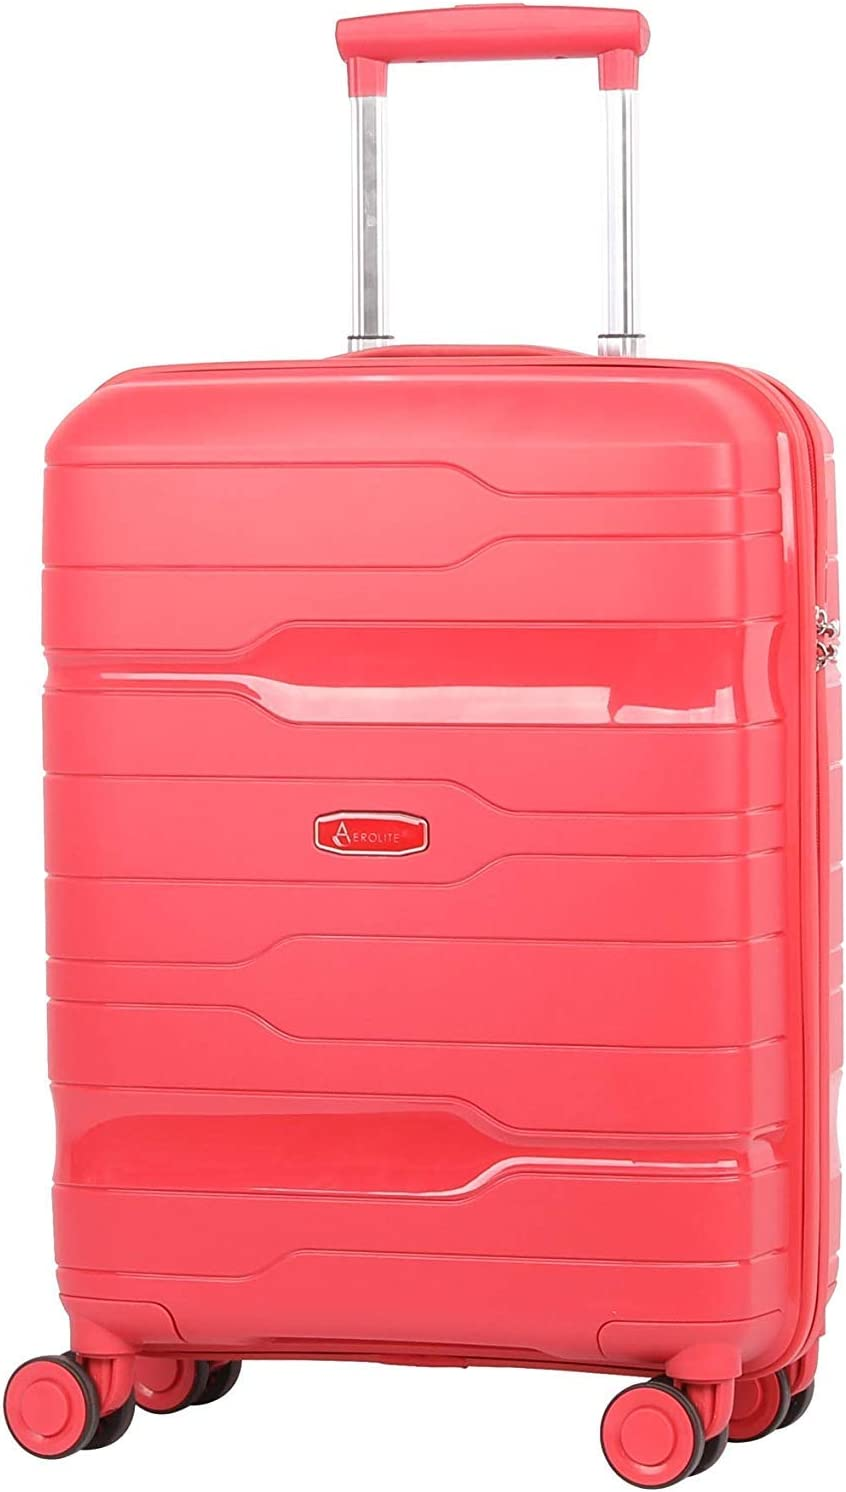 Aerolite Premium Hard Shell 8 Ruedas Carry On Hand Cabin Equipaje Maleta 55x40x20 cm con Cerradura TSA incorporada de 3 dígitos, Aprobada para Ryanair, easyJet, British Airways (Merlot)